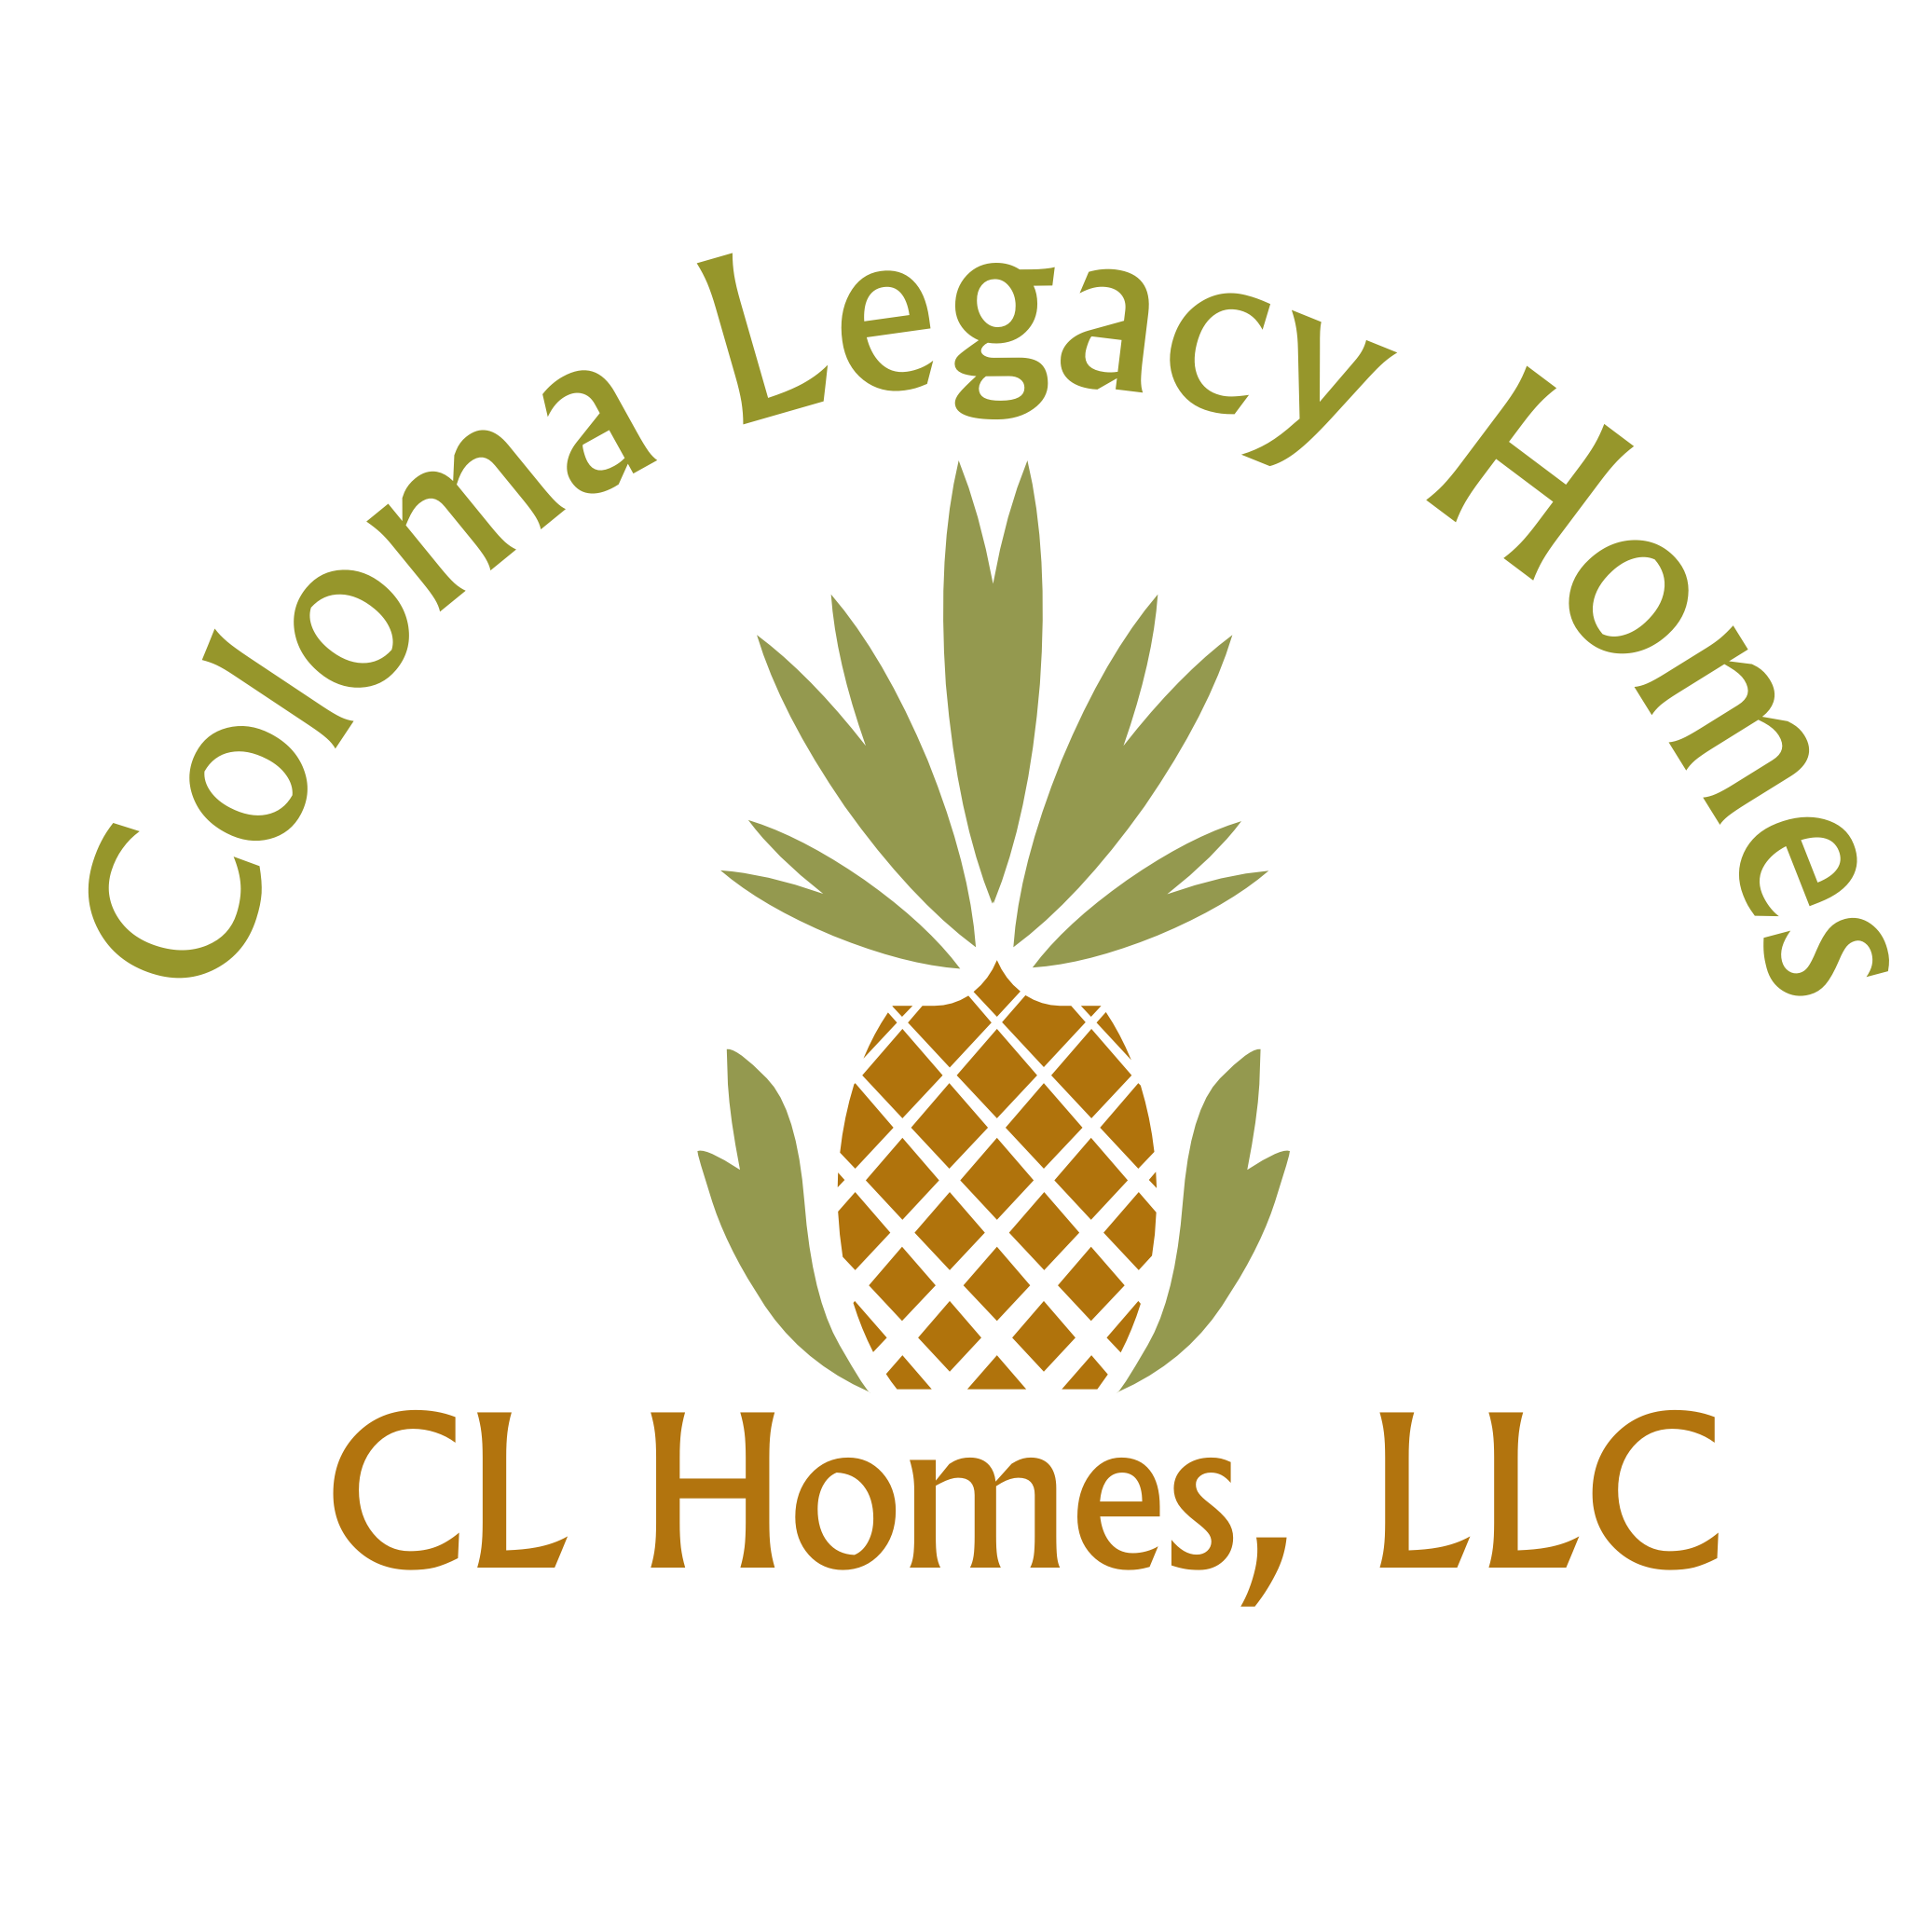 CL Homes, LLC